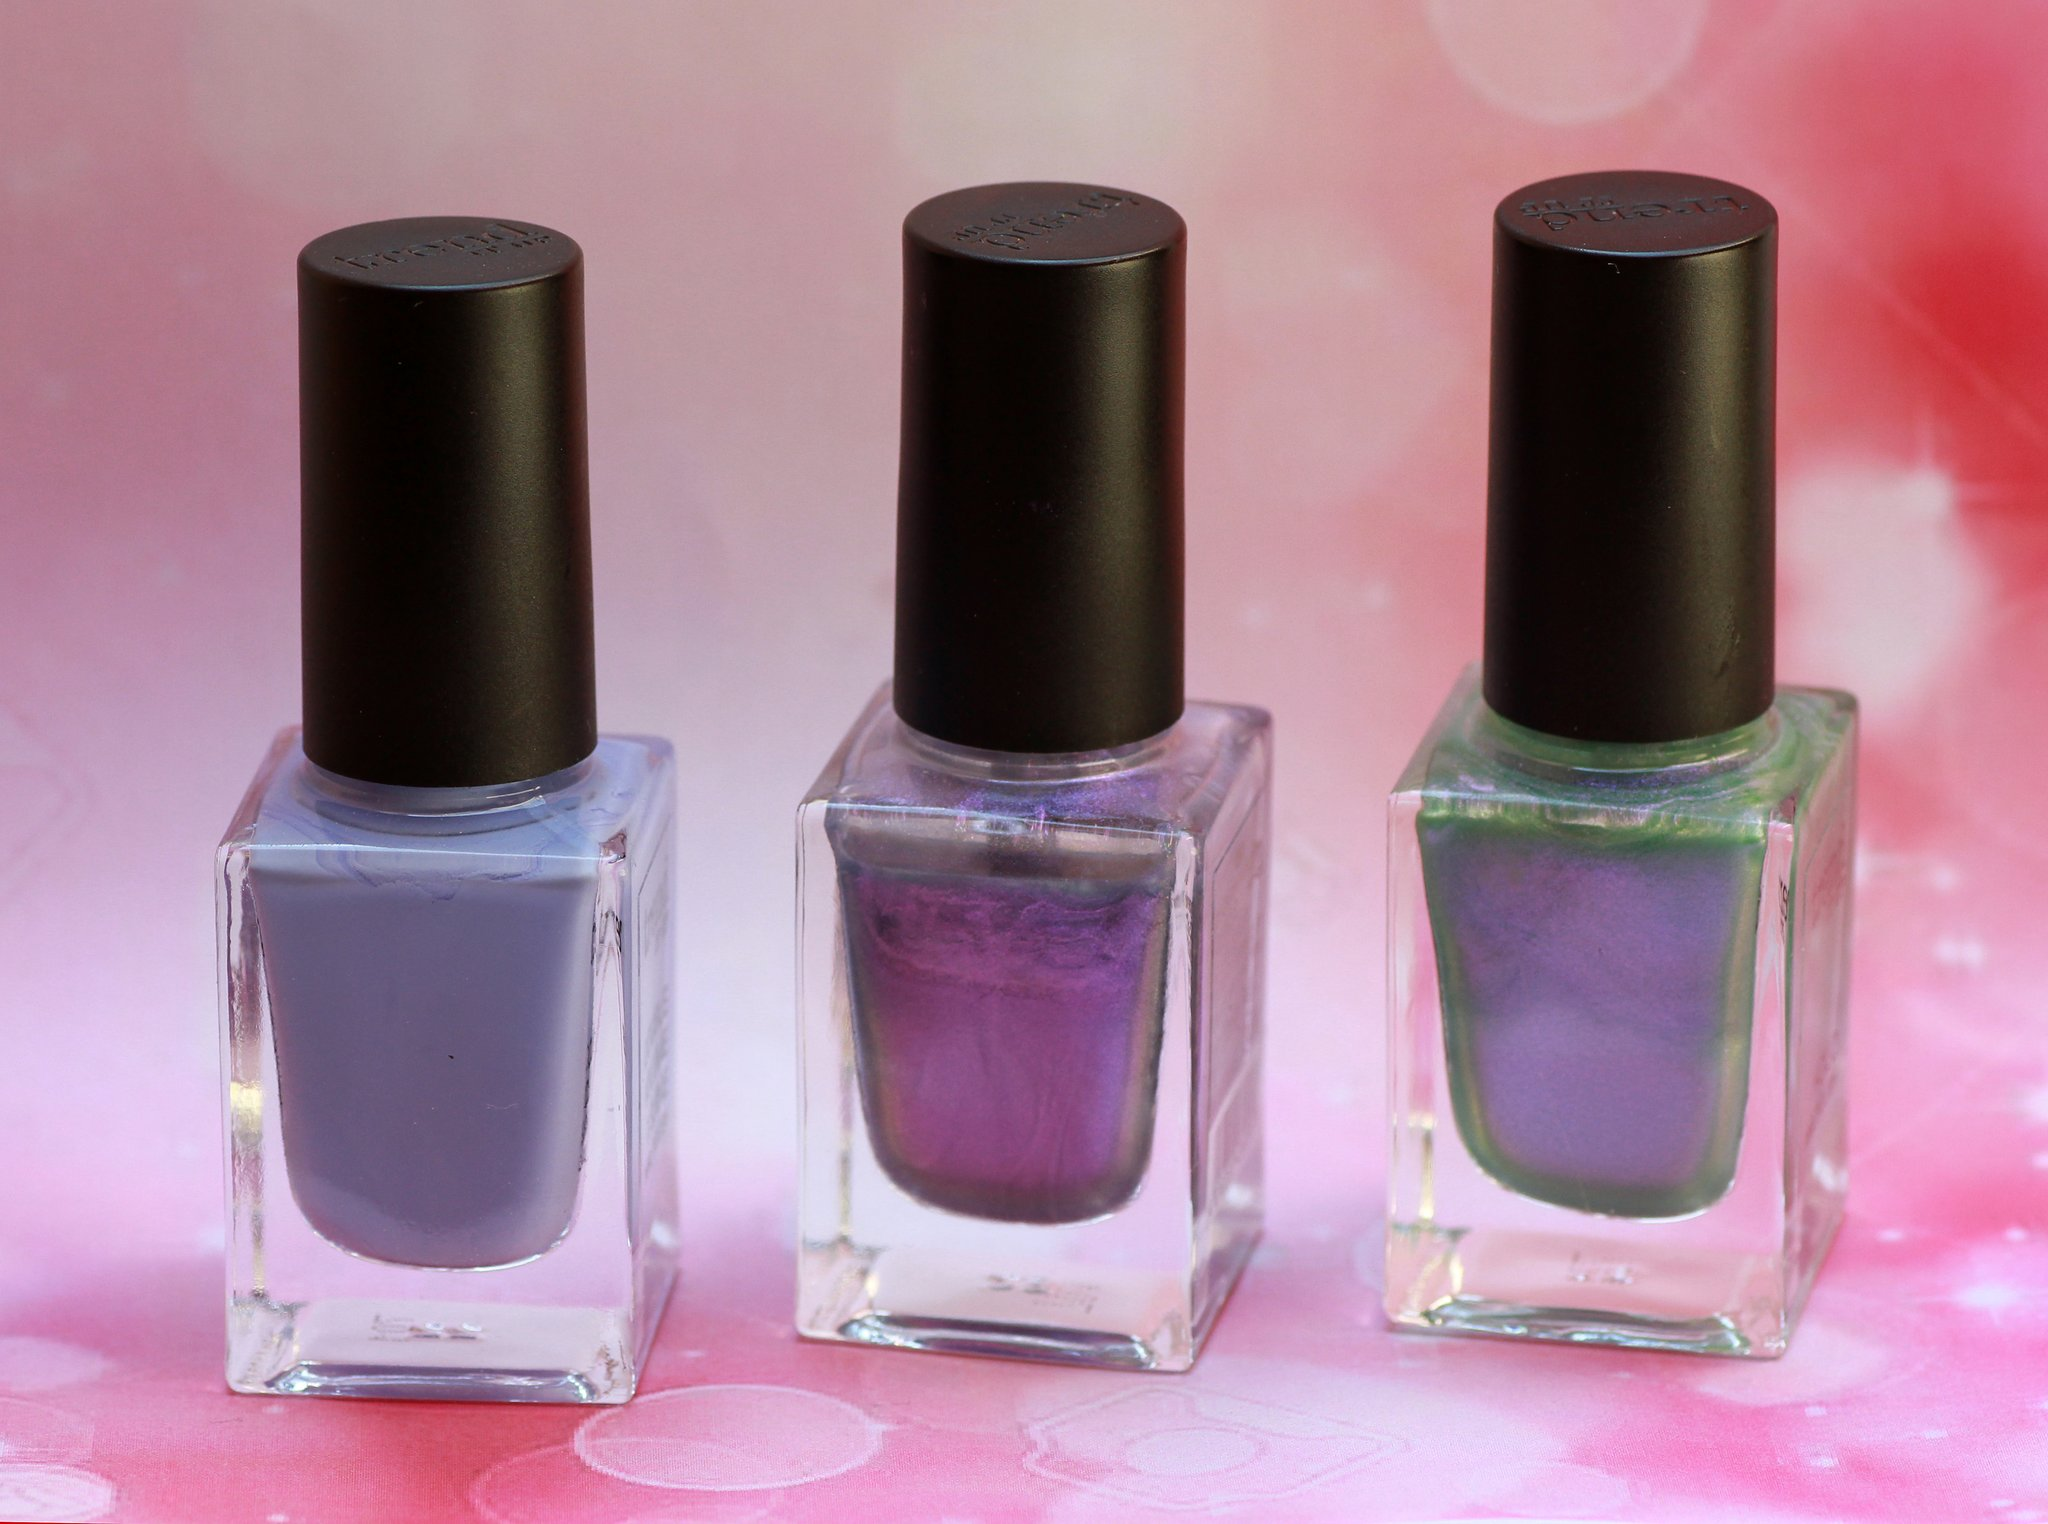 Datteln: Kosmetikkurs für Patientinnen mit Krebserkrankungen - Datteln - Lokalkompass.de